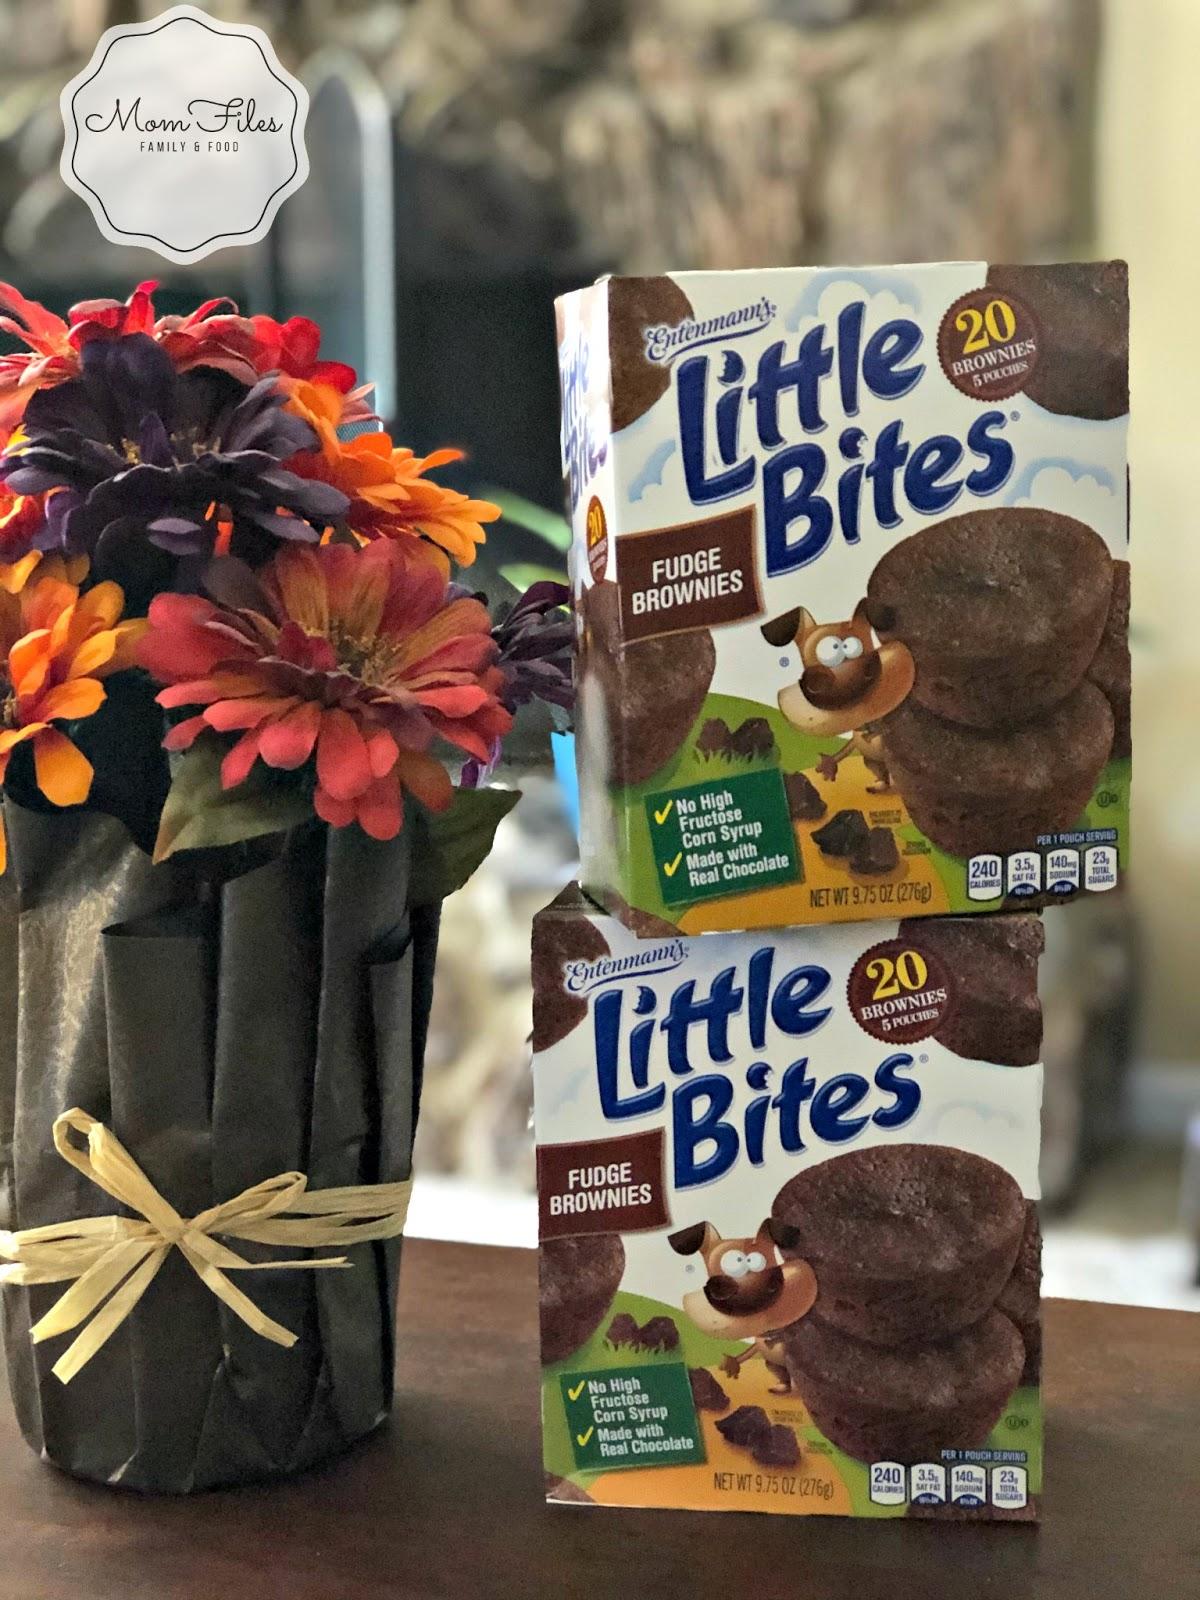 Little Bites Visit Myrtle Beach Hy